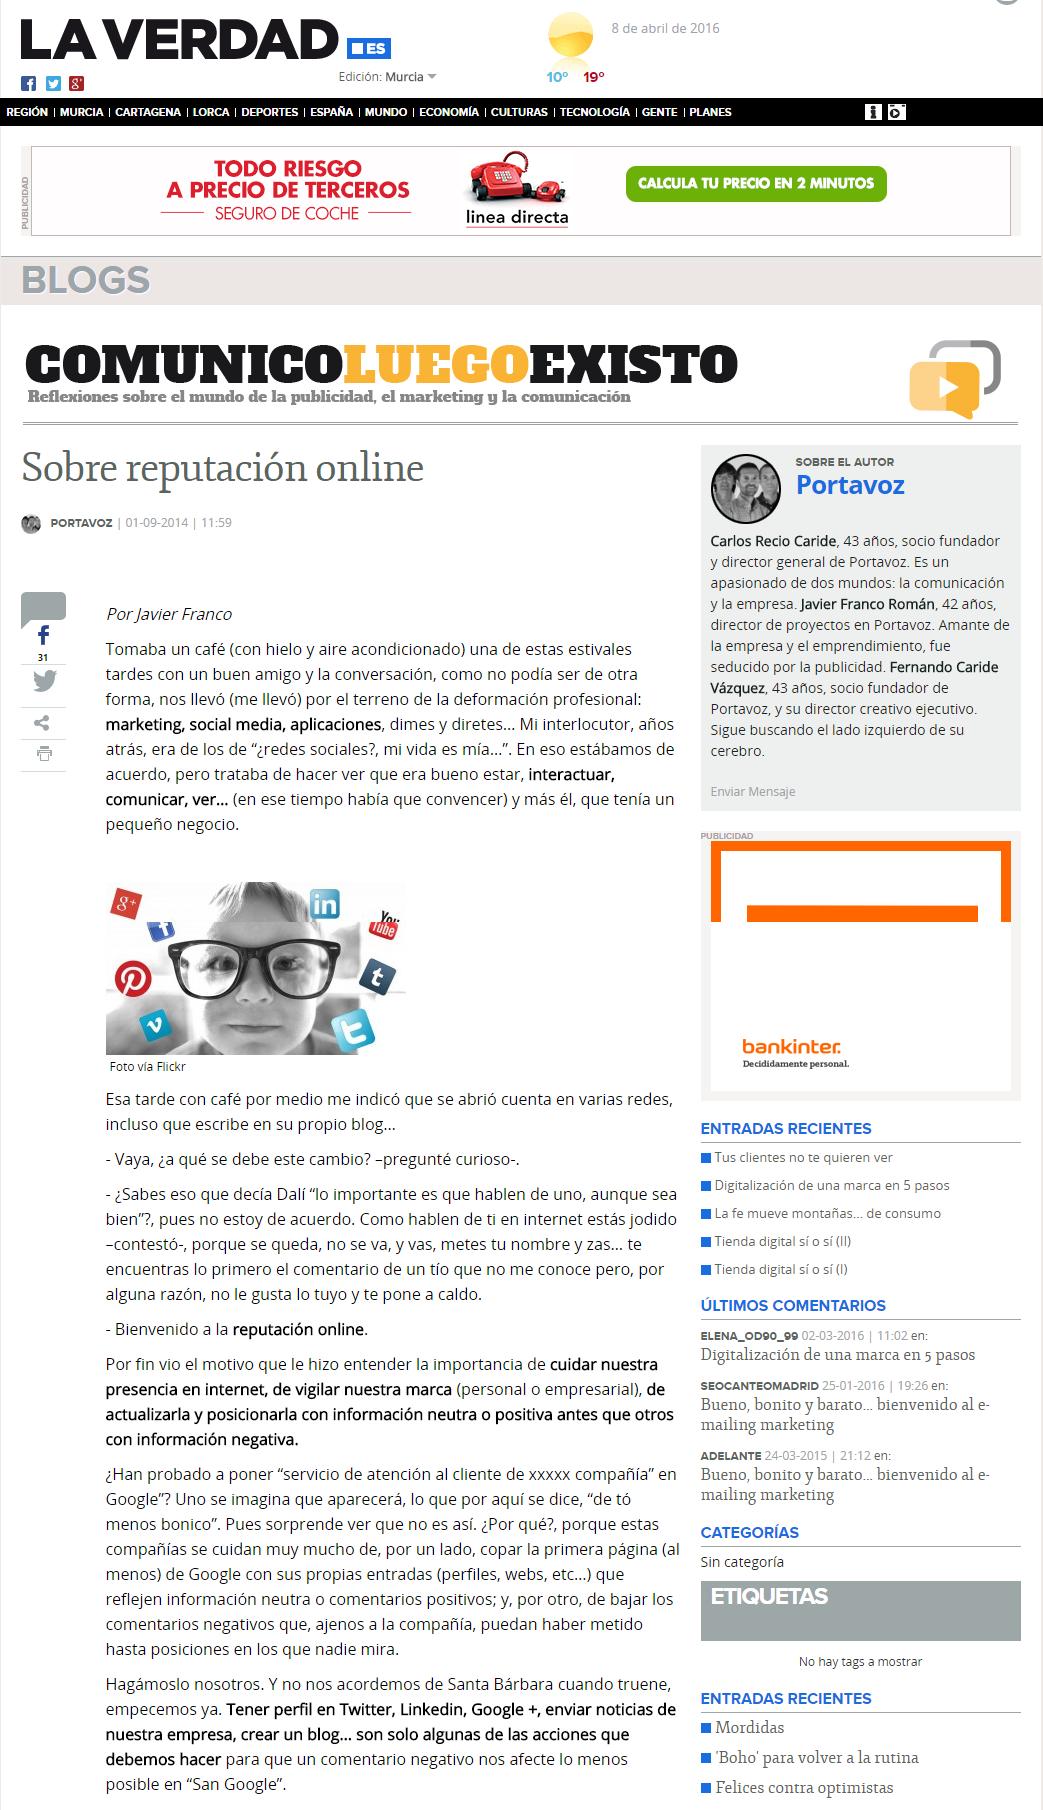 FireShot Capture 98 - Sobre reputación online I Comunico, lu_ - http___blogs.laverdad.es_comunicol